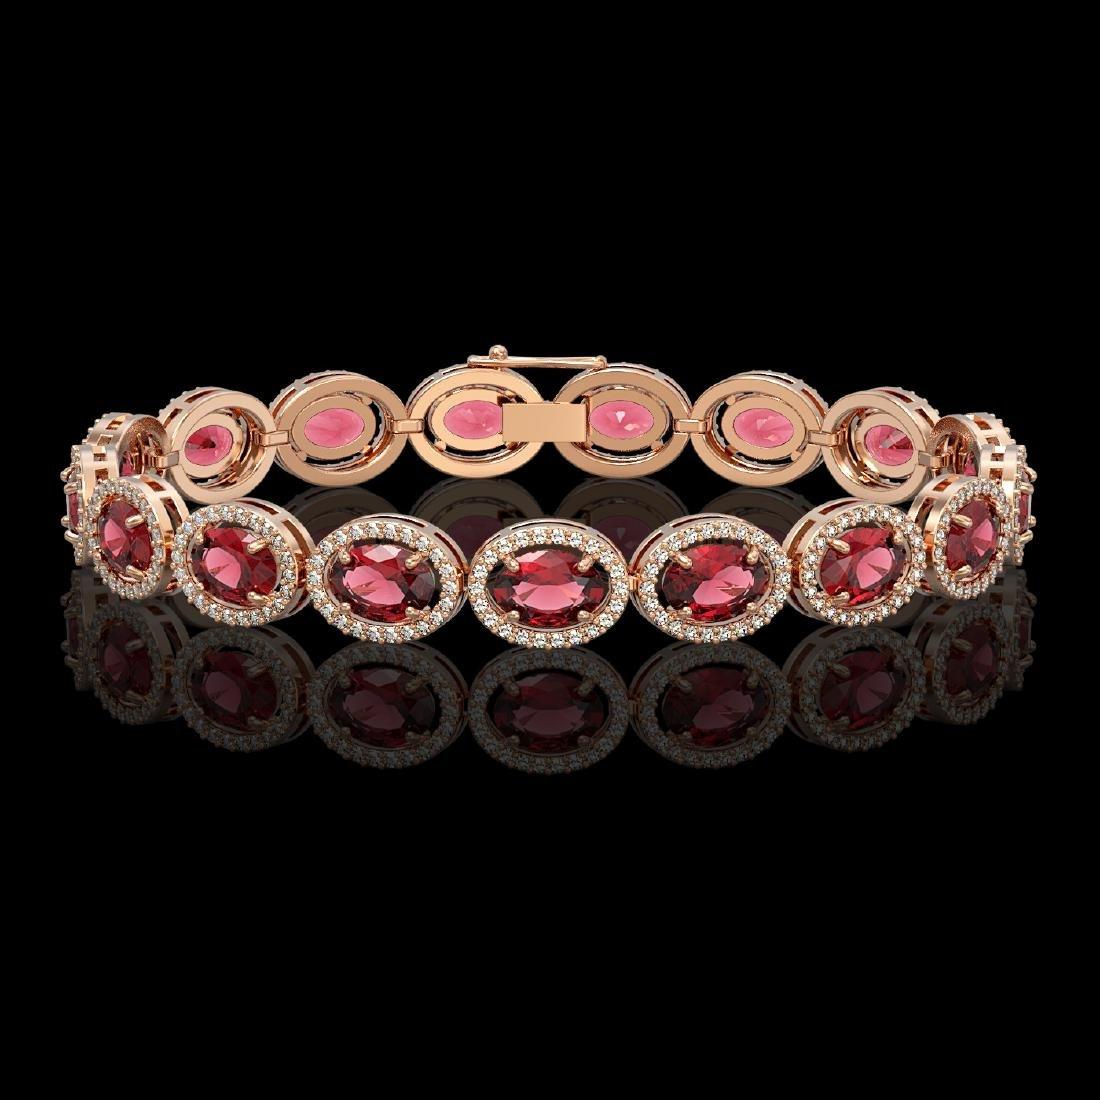 21.71 CTW Tourmaline & Diamond Halo Bracelet 10K Rose